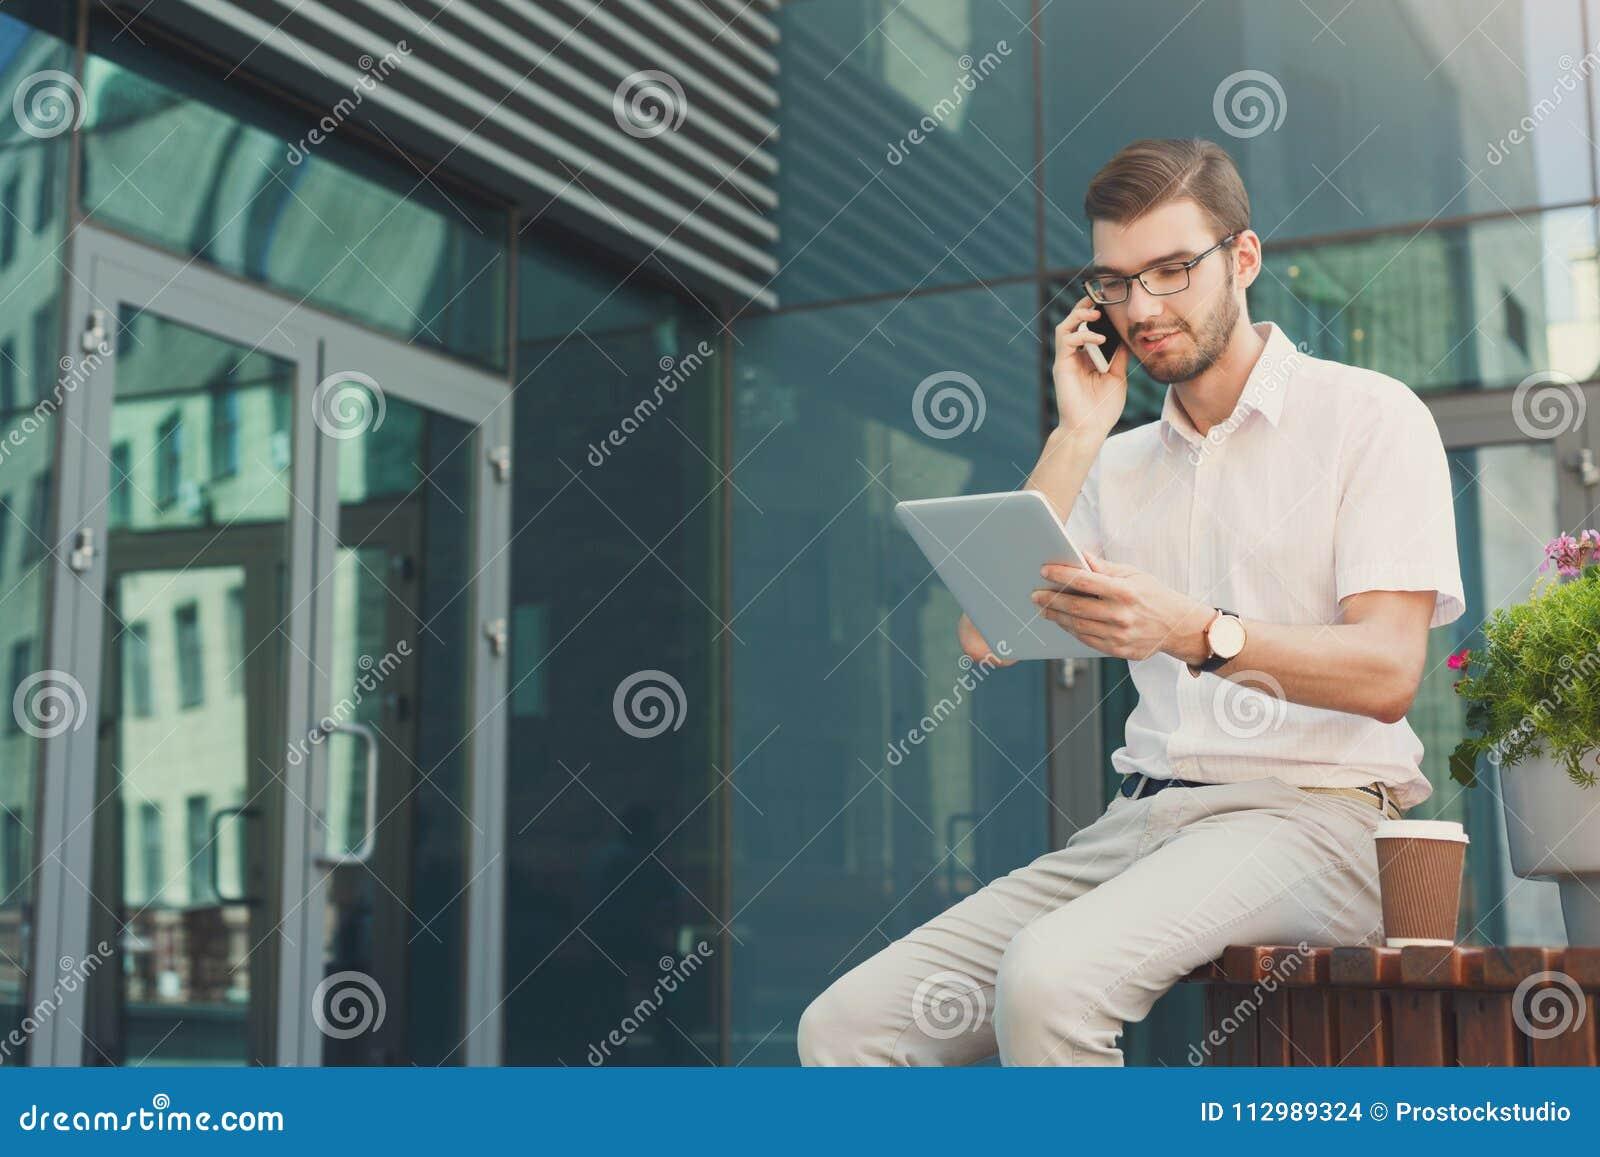 Thoughtful businessman multitasking outdoors